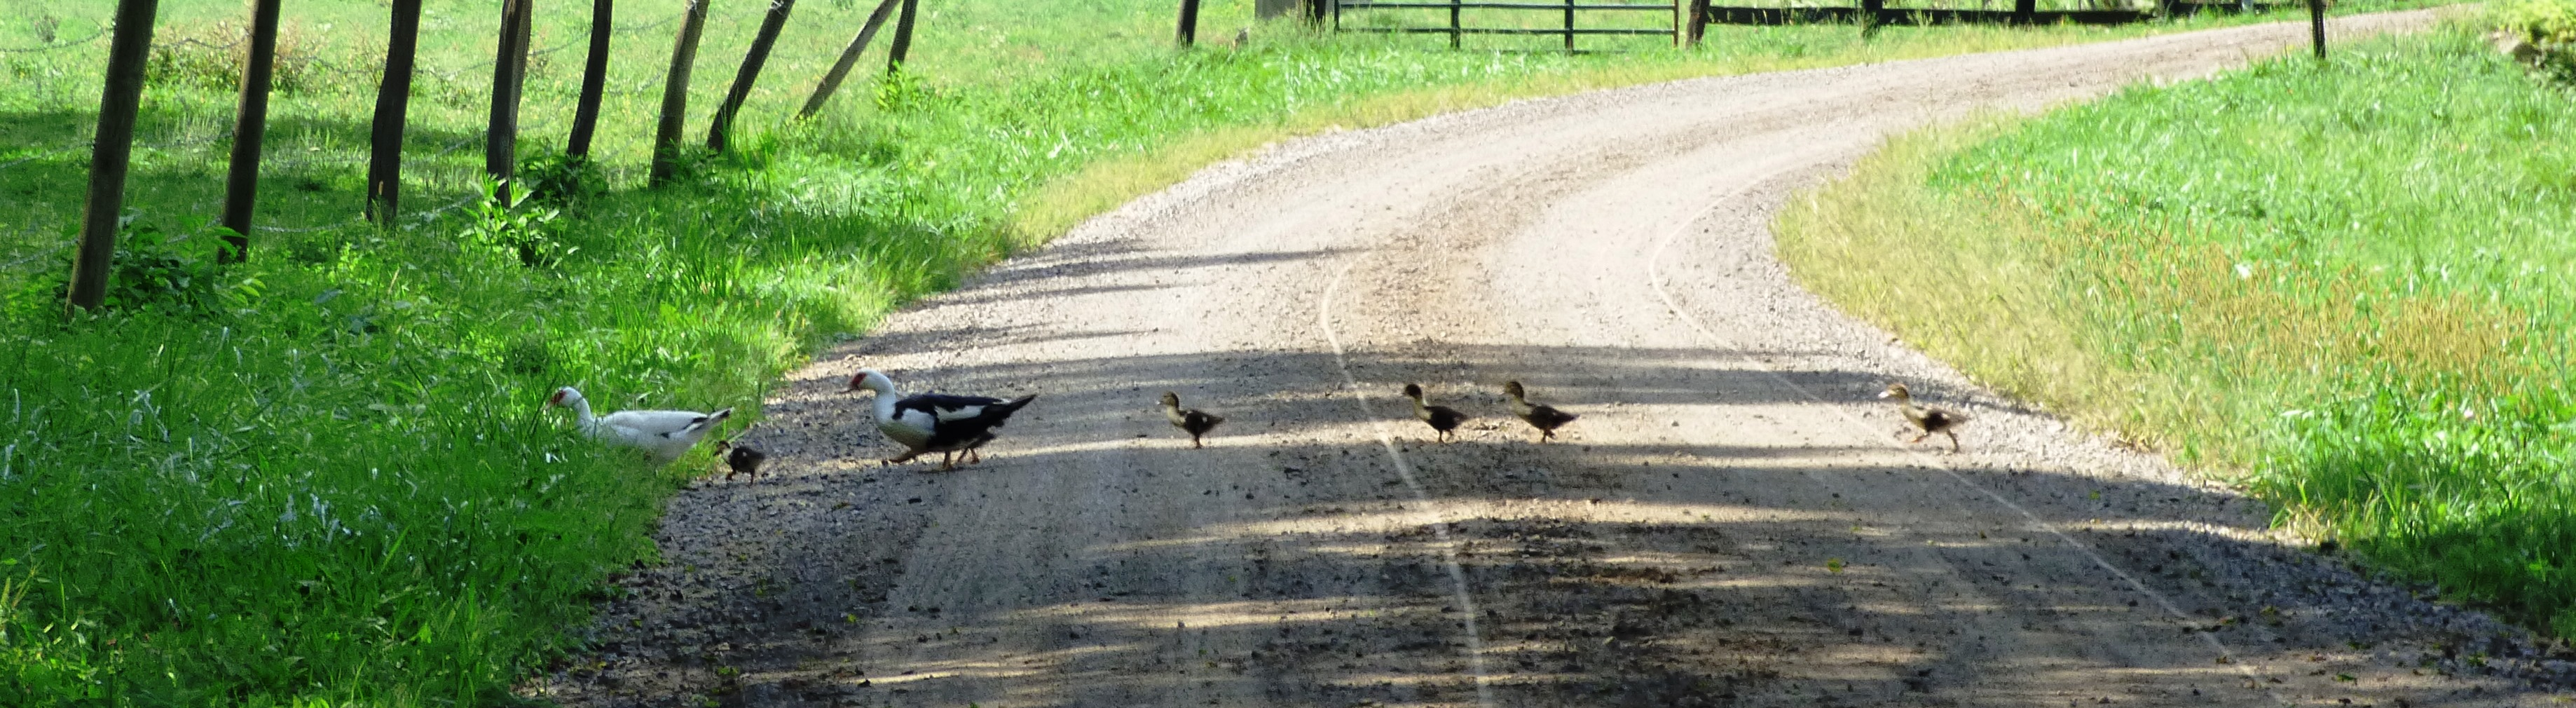 Ducks P1030131